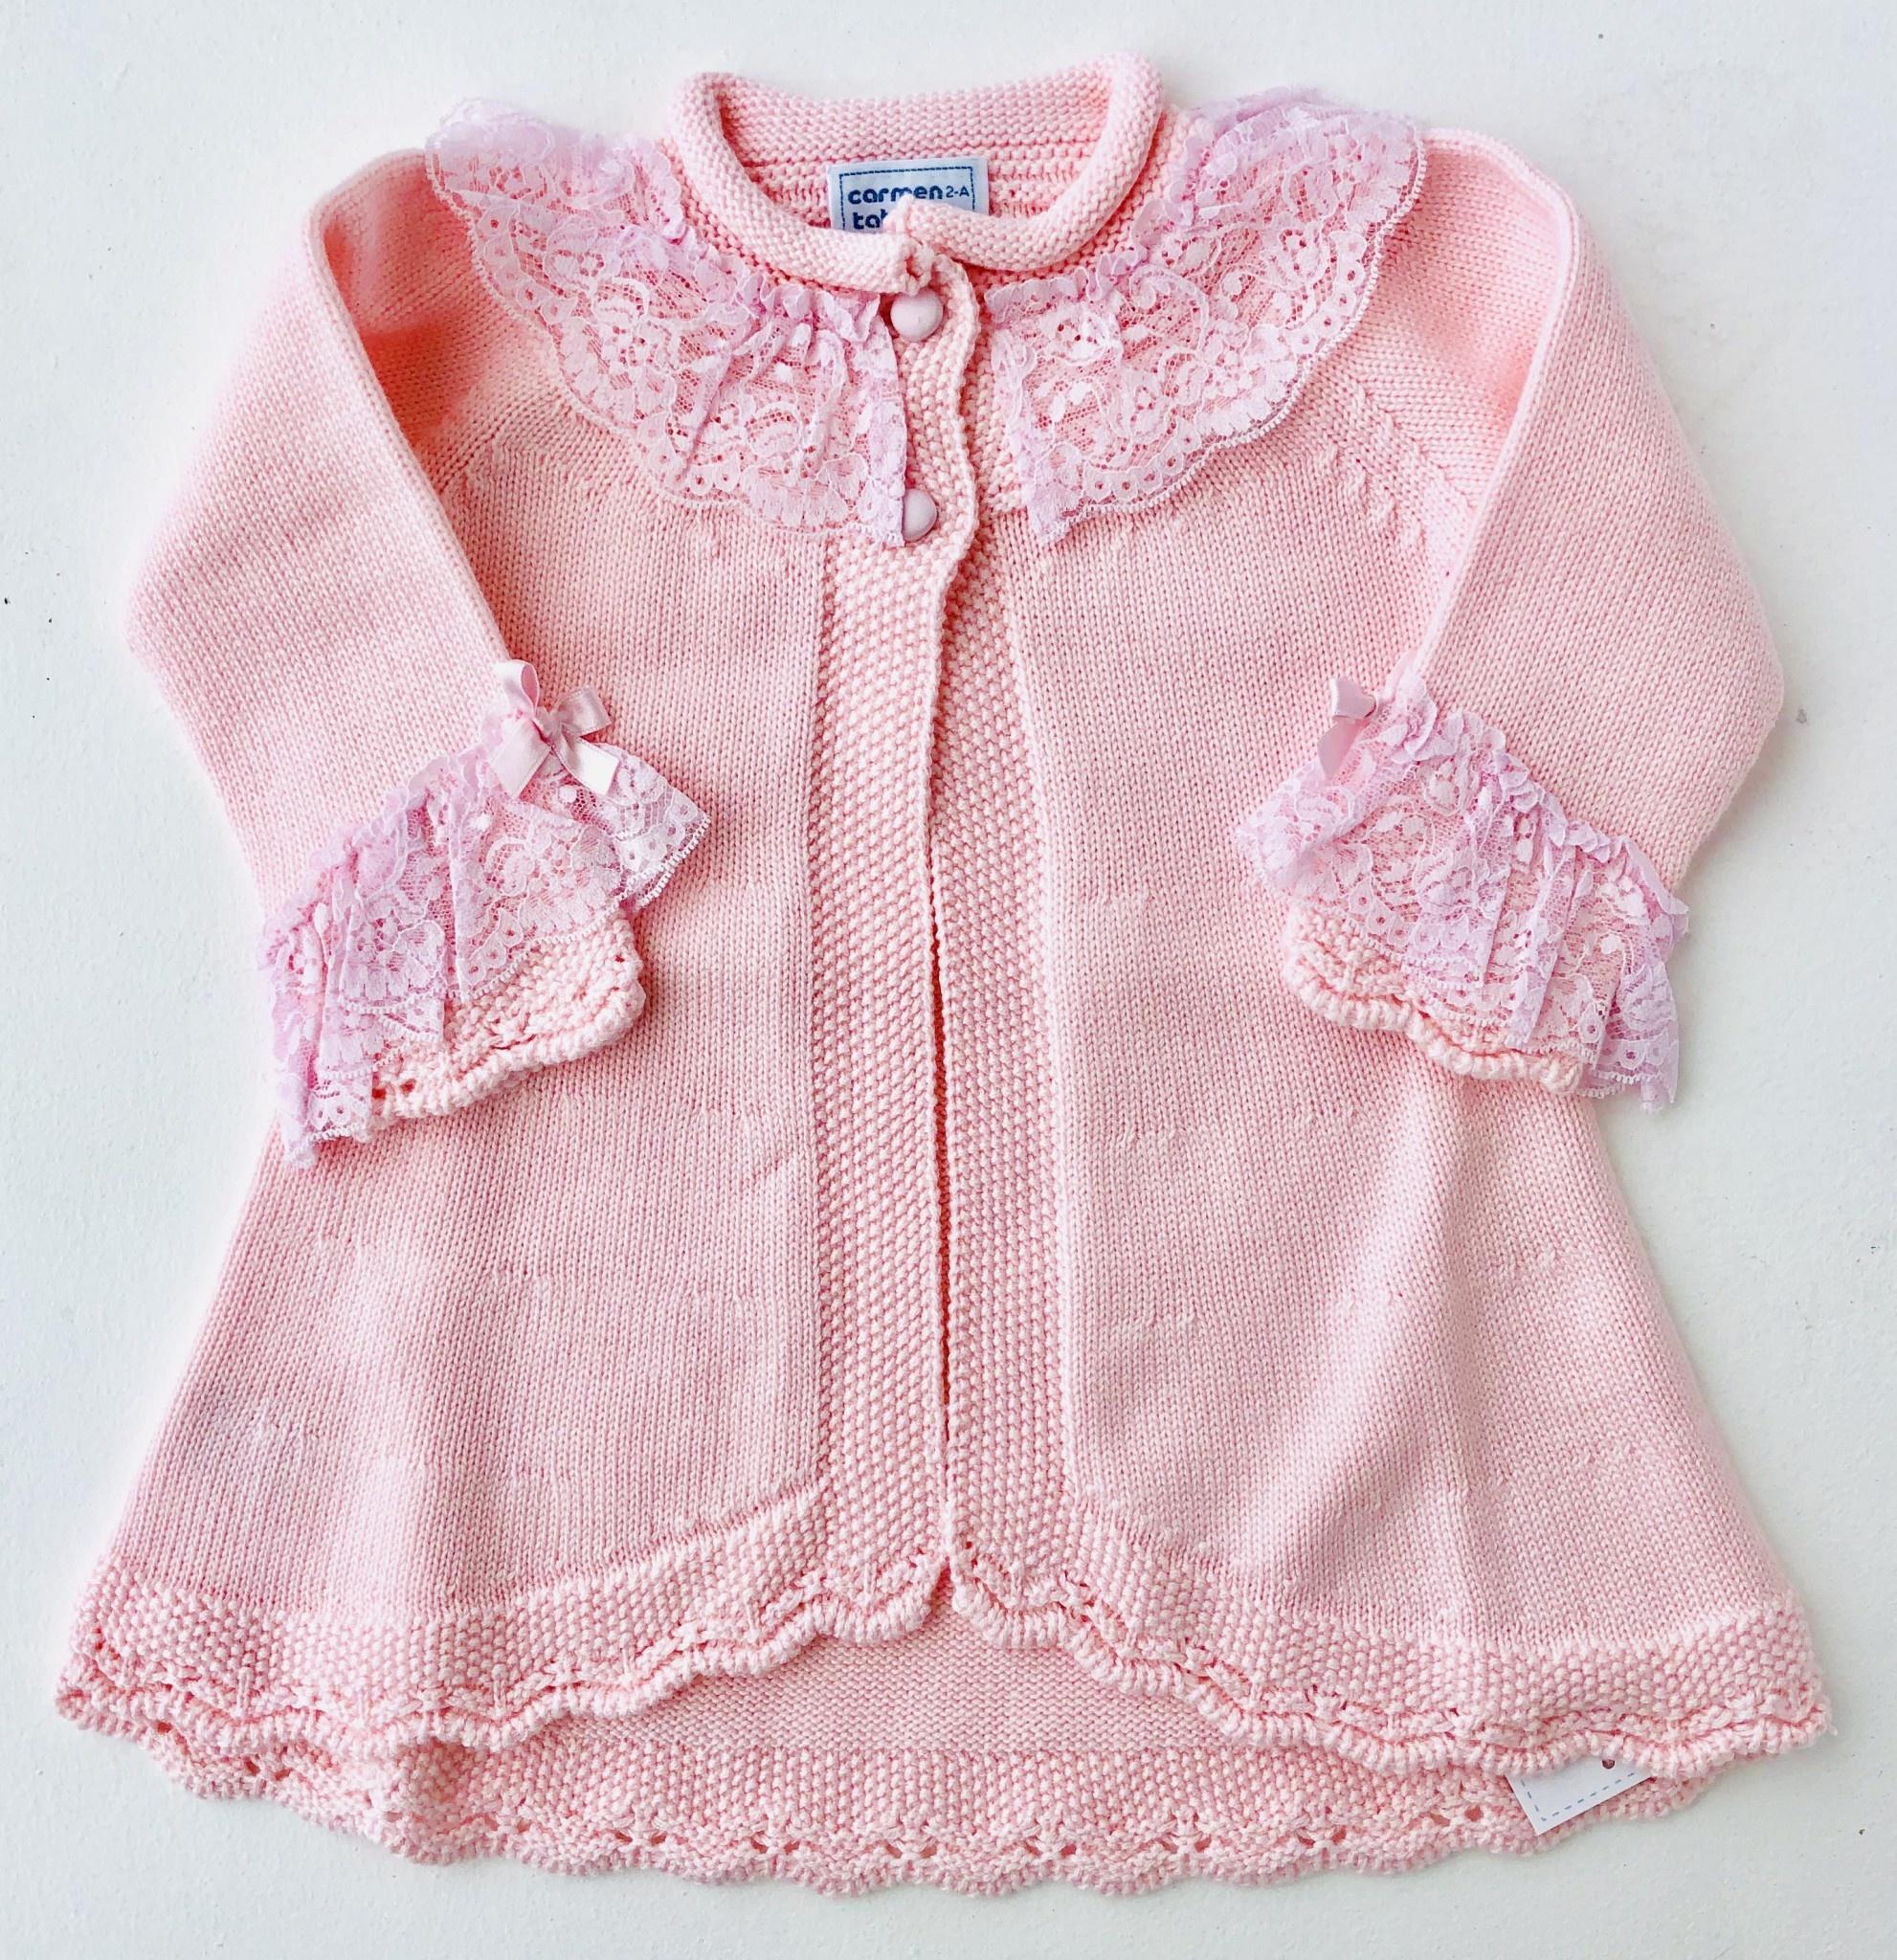 Carmen Taberner Carmen Taberner Pink Knit Cardigan